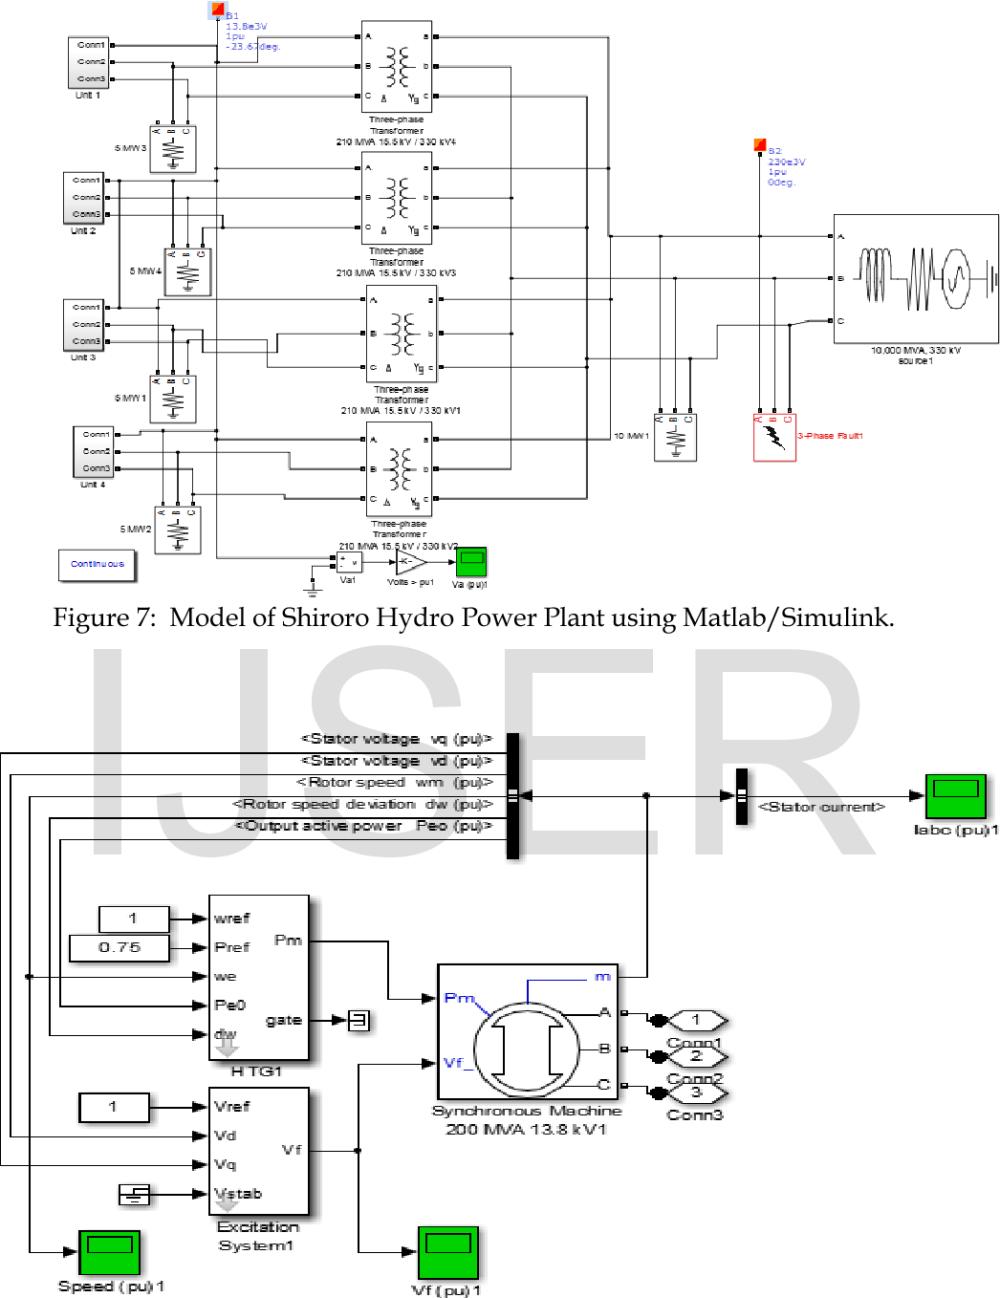 medium resolution of figure 7 model of shiroro hydro power plant using matlab simulink